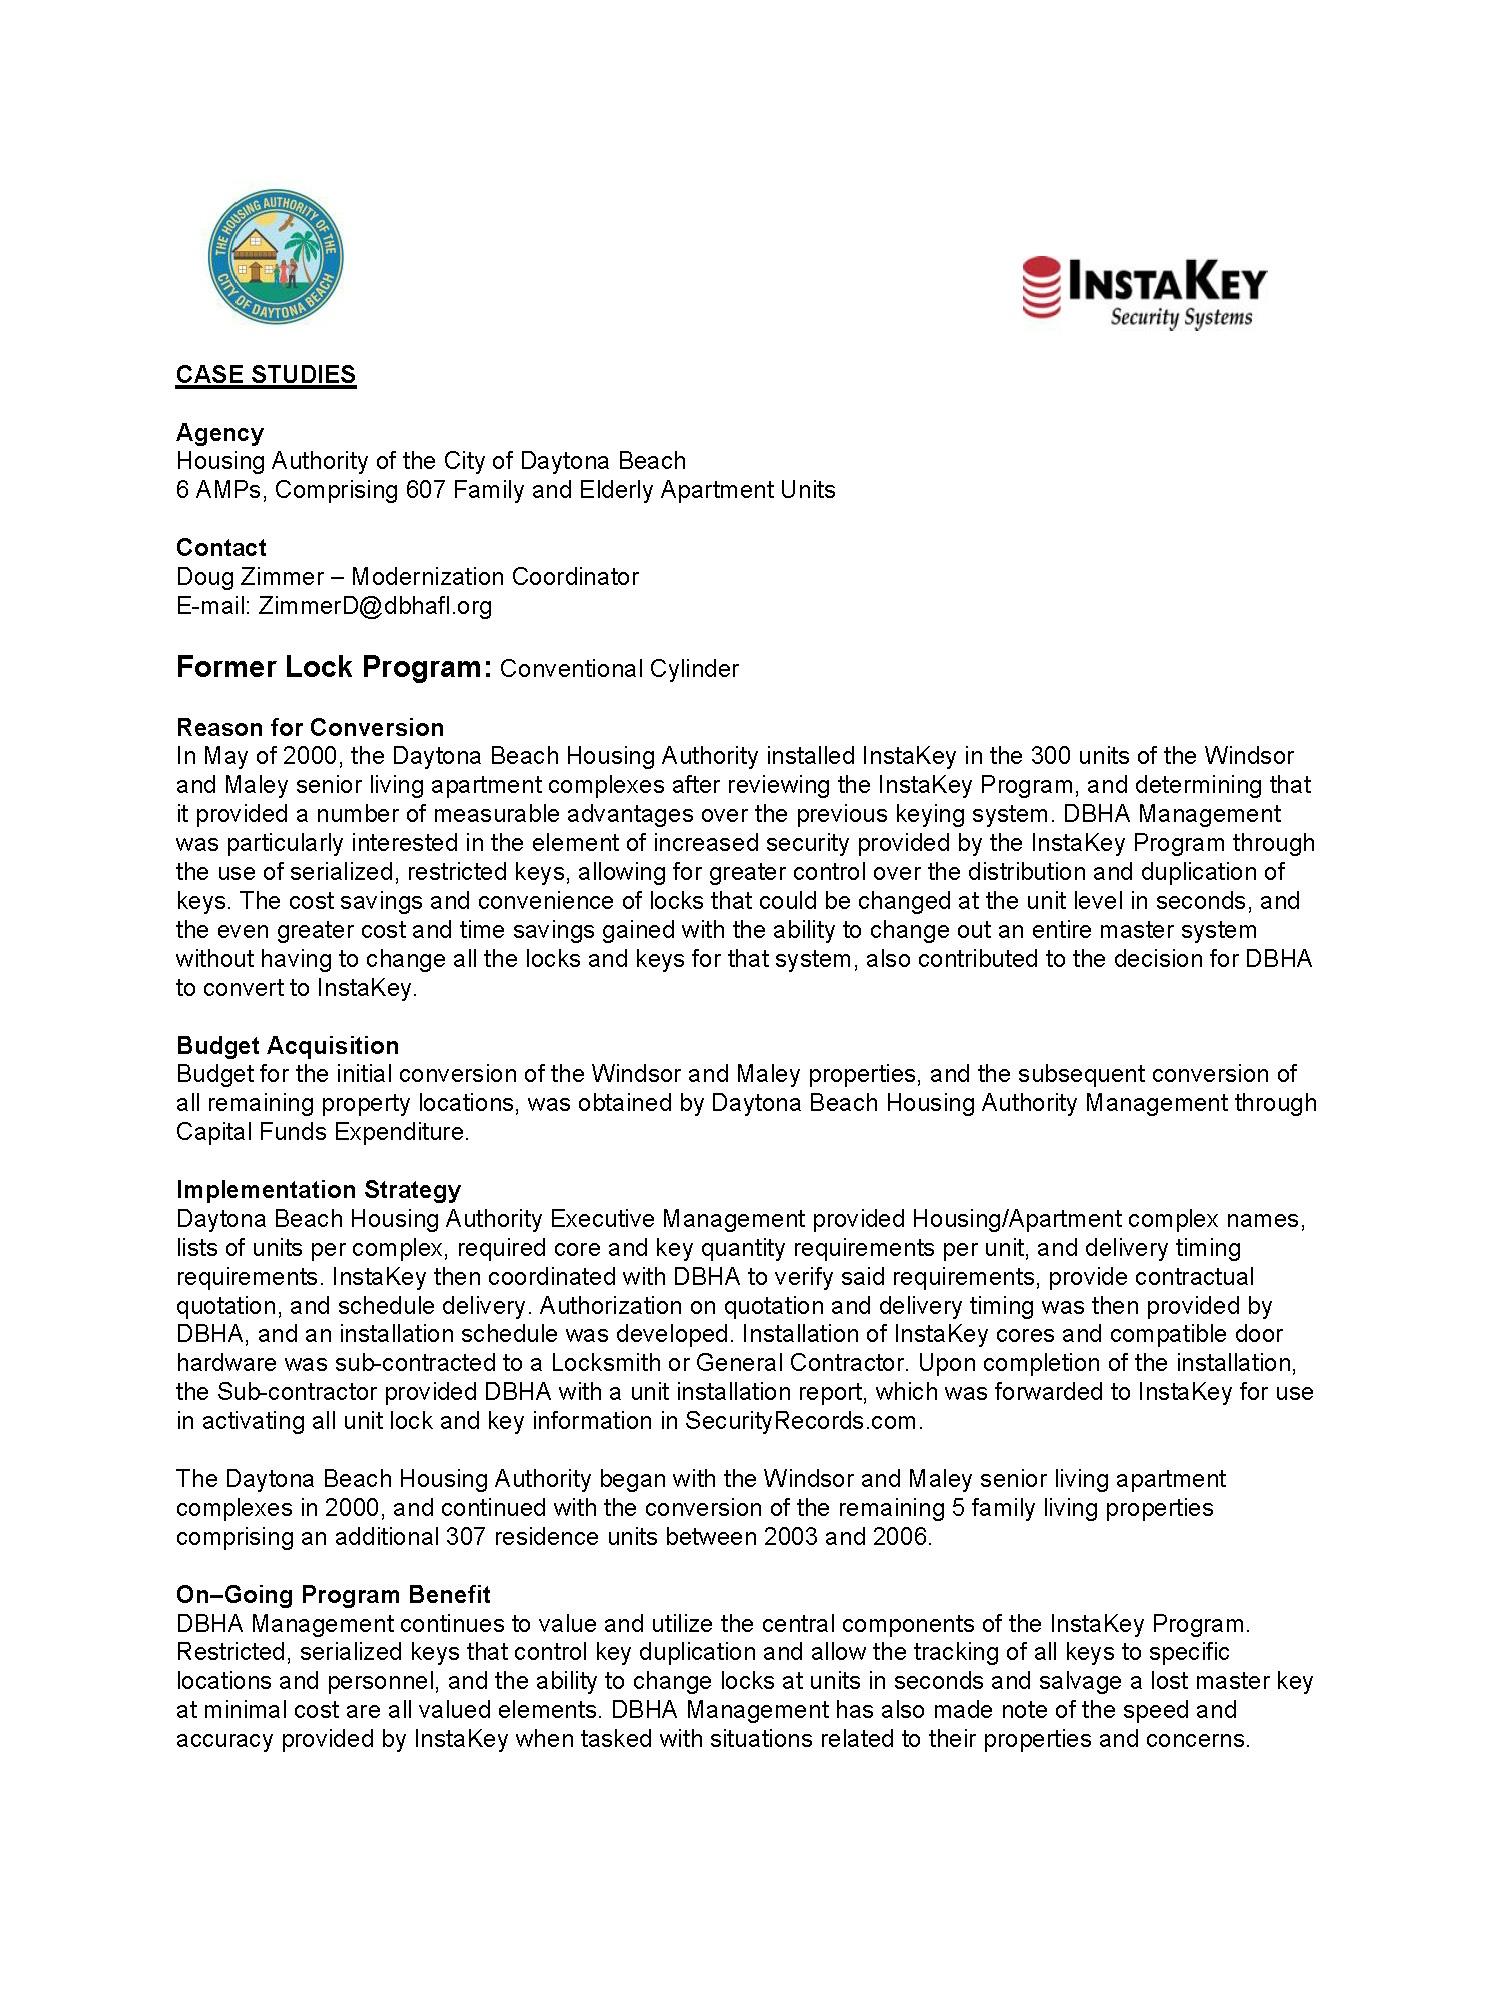 Daytona Beach Housing Authority – A Case Study